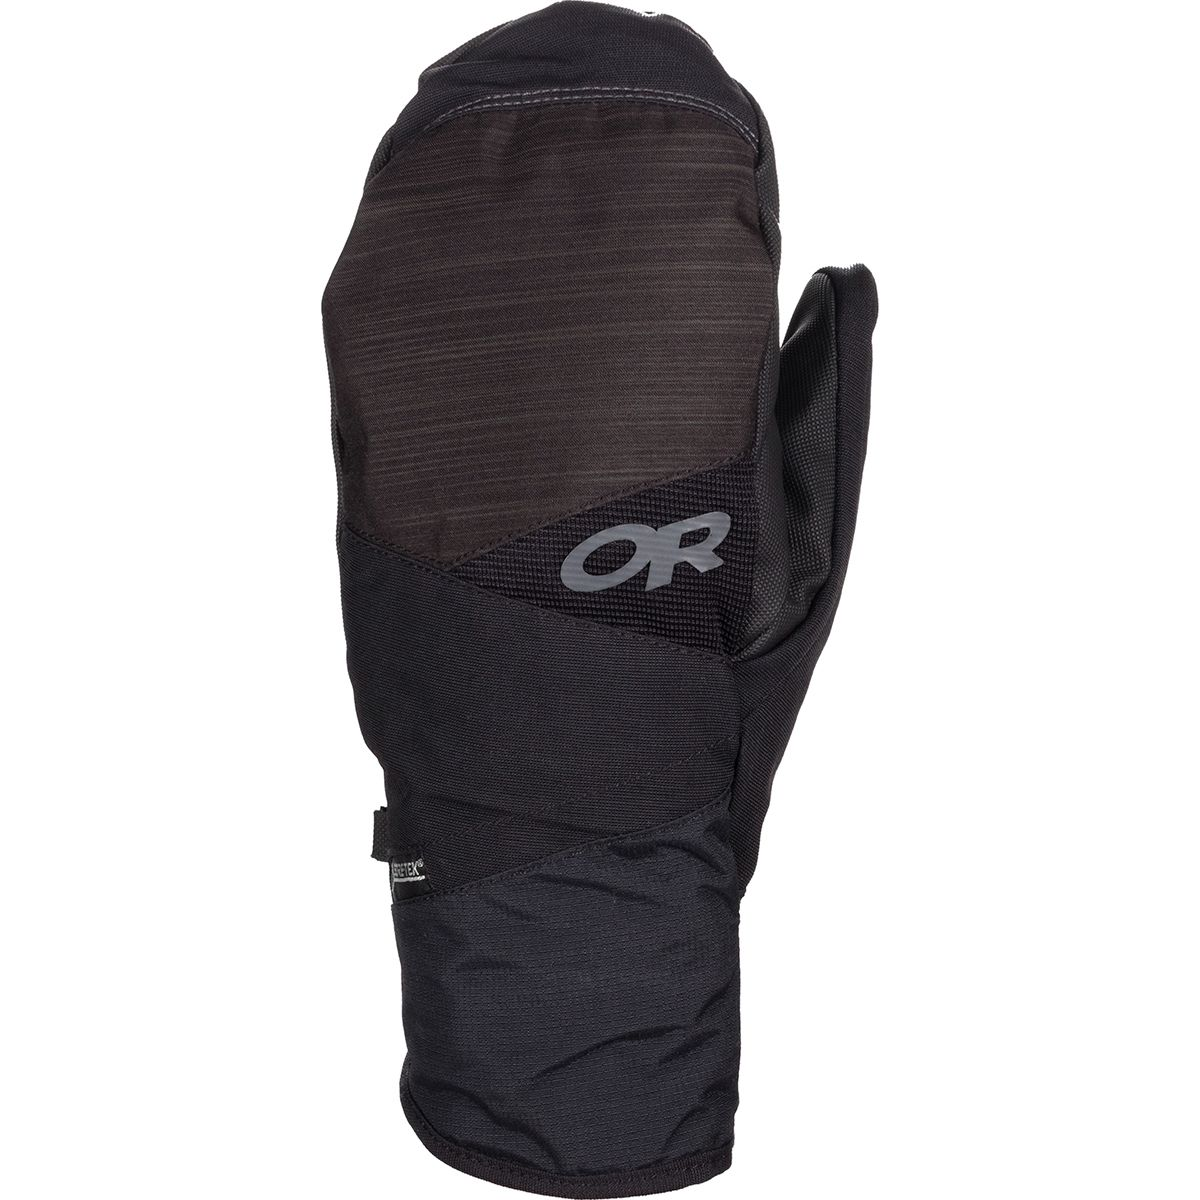 photo: Outdoor Research Centurion Mitts waterproof glove/mitten